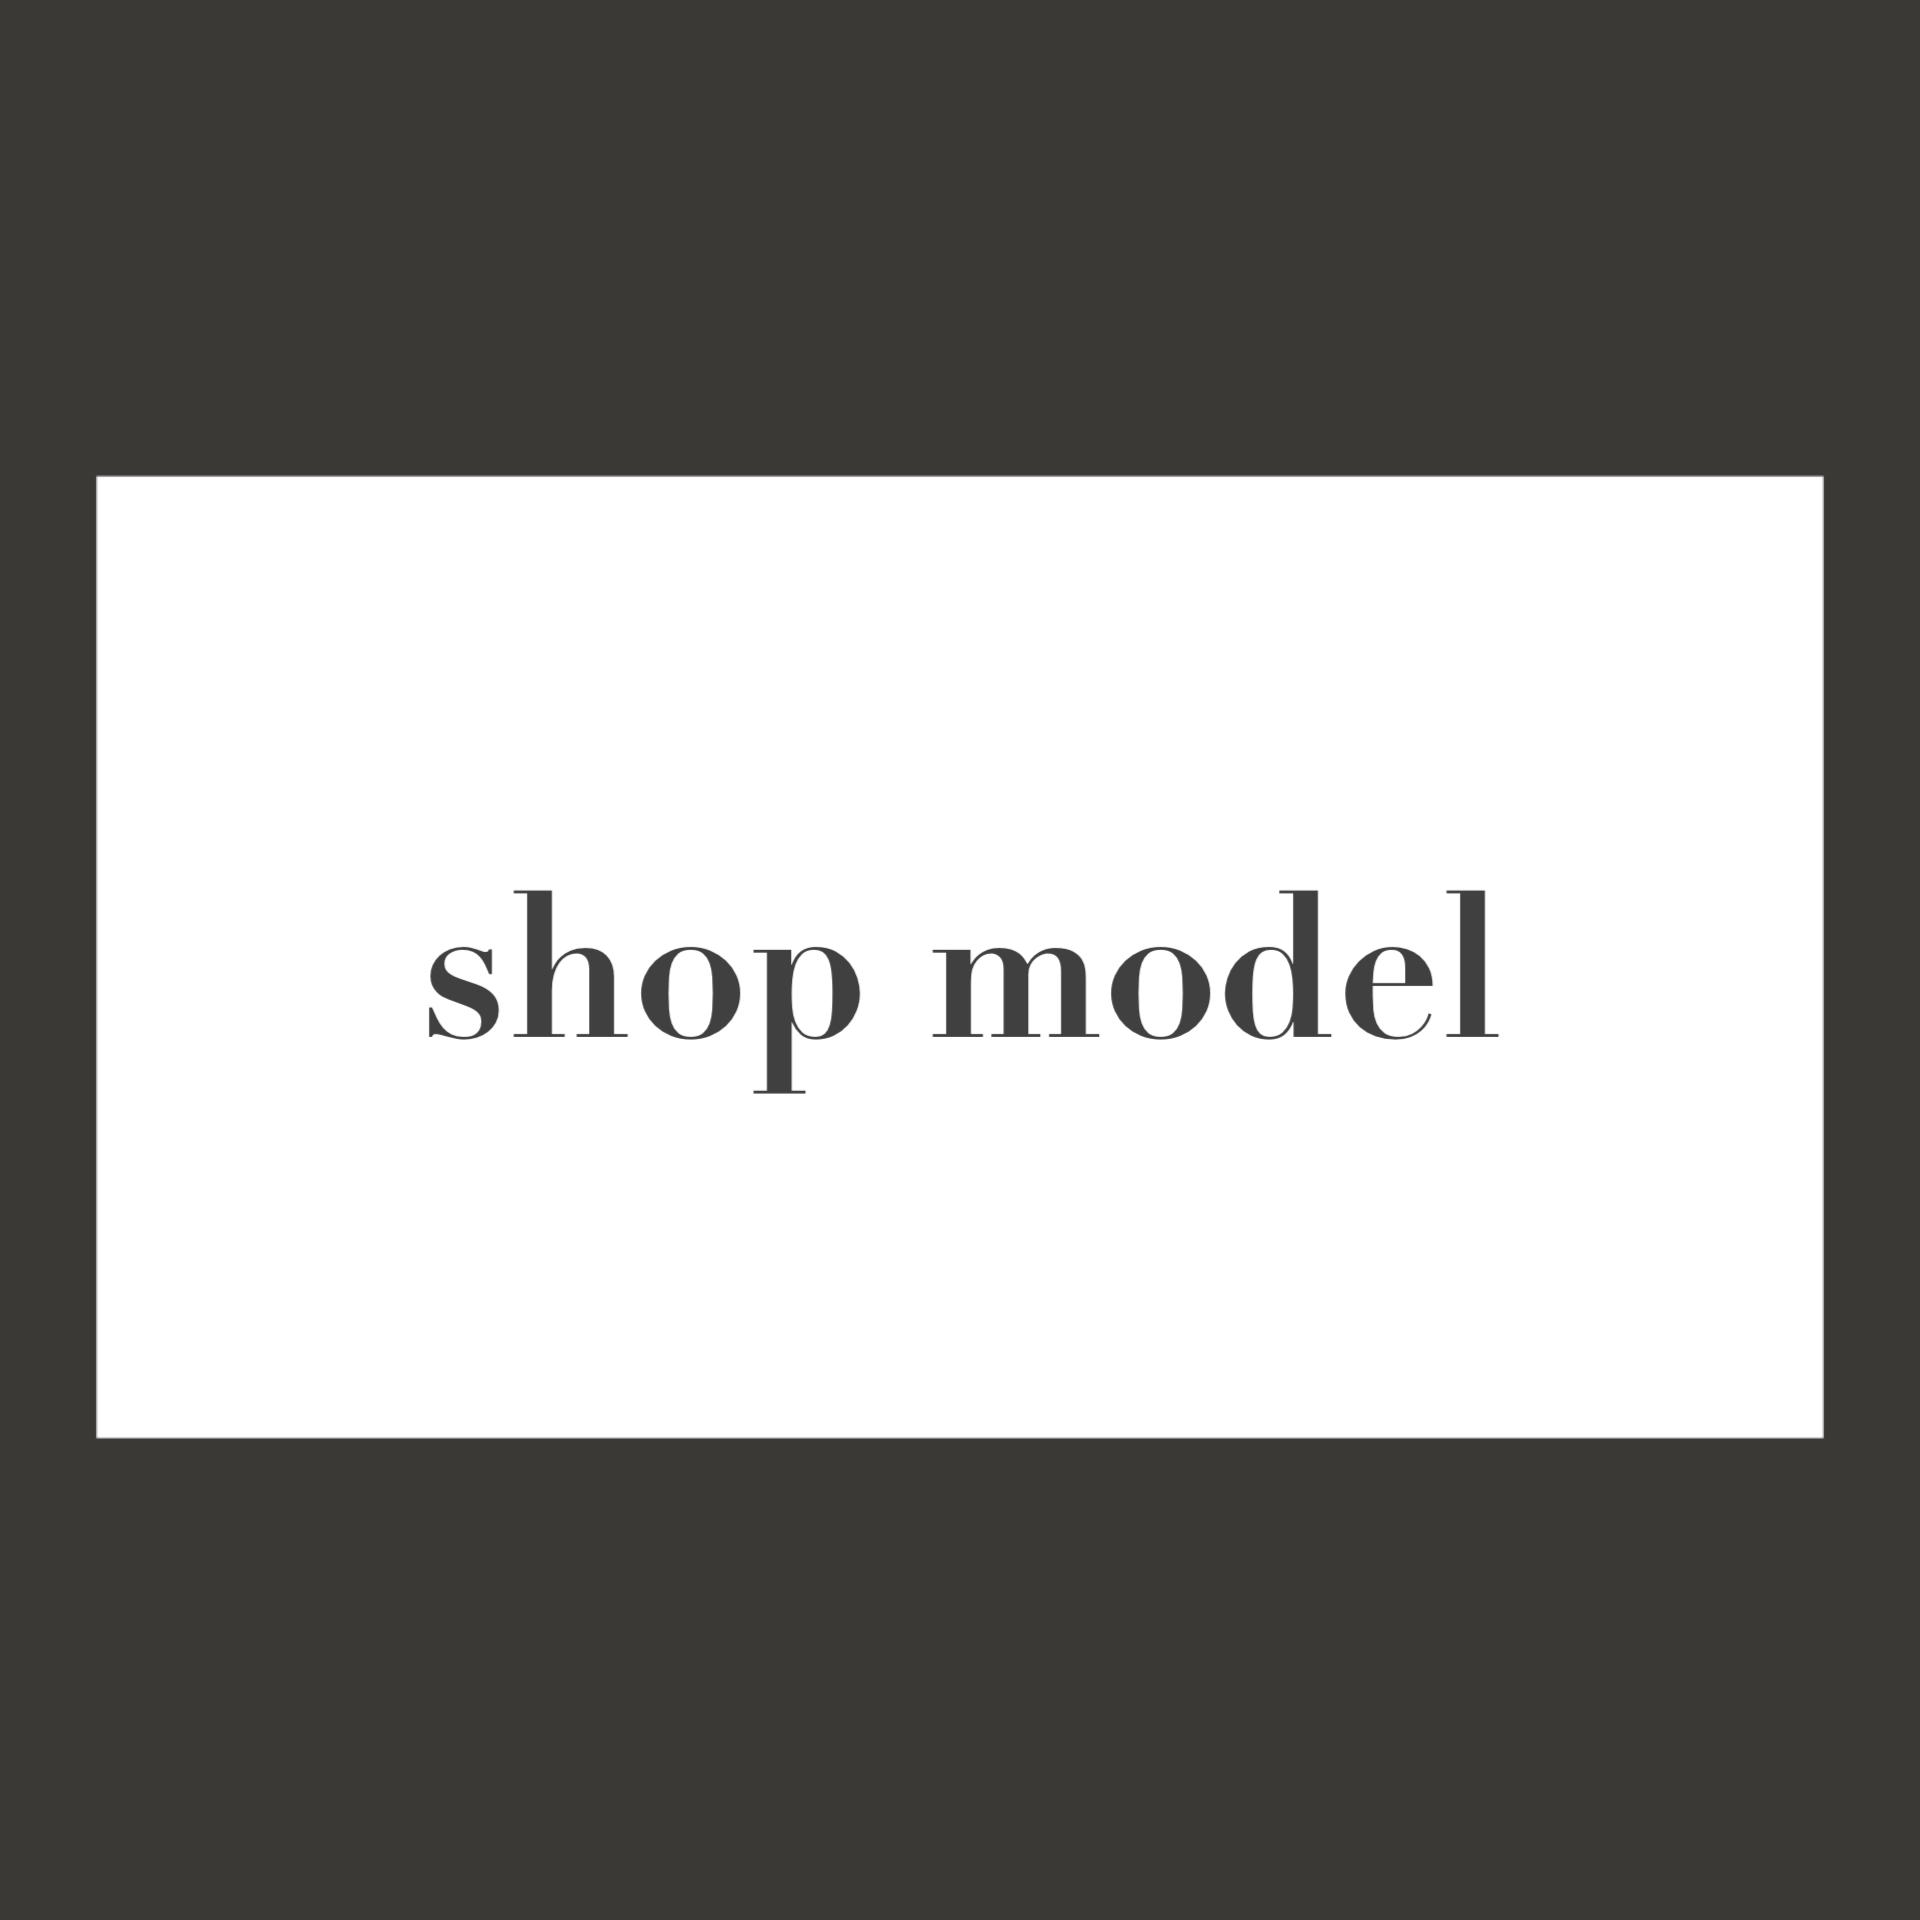 shop model service